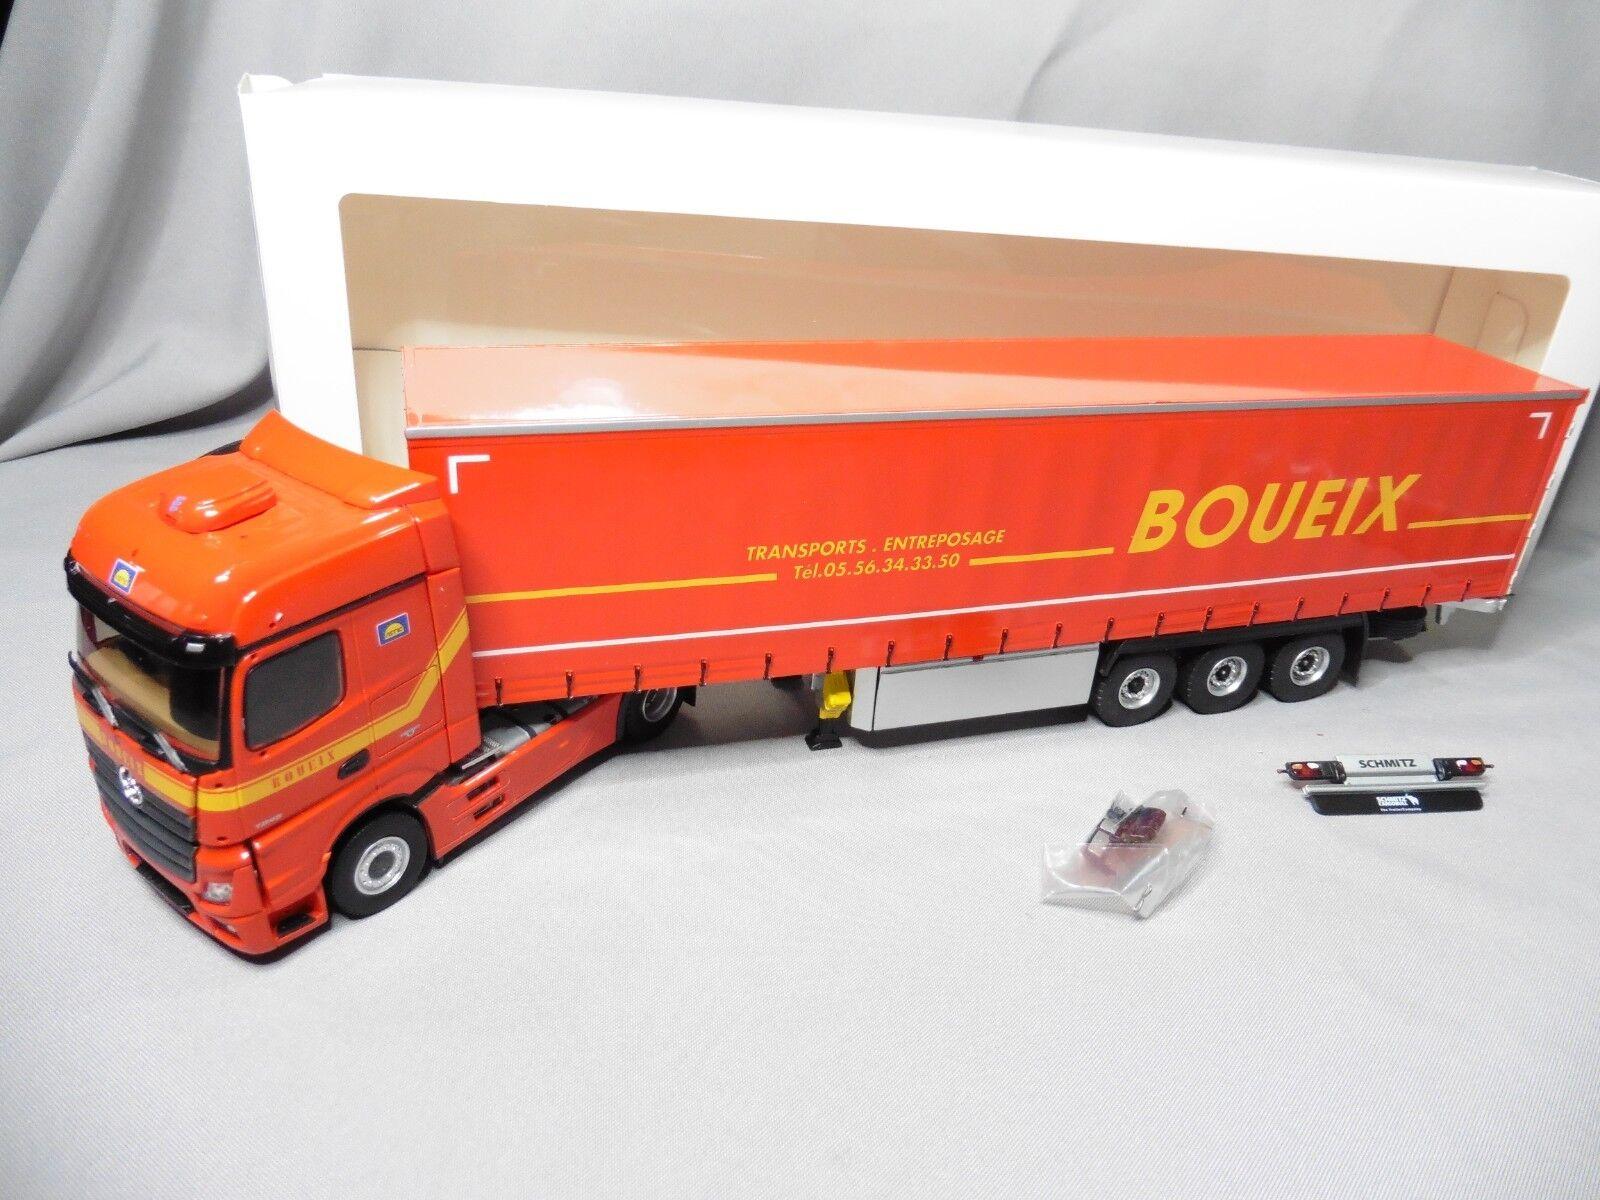 Dv8751 eligor 1 43 mercedes actros mp4 bigspace boueix 114888 transport